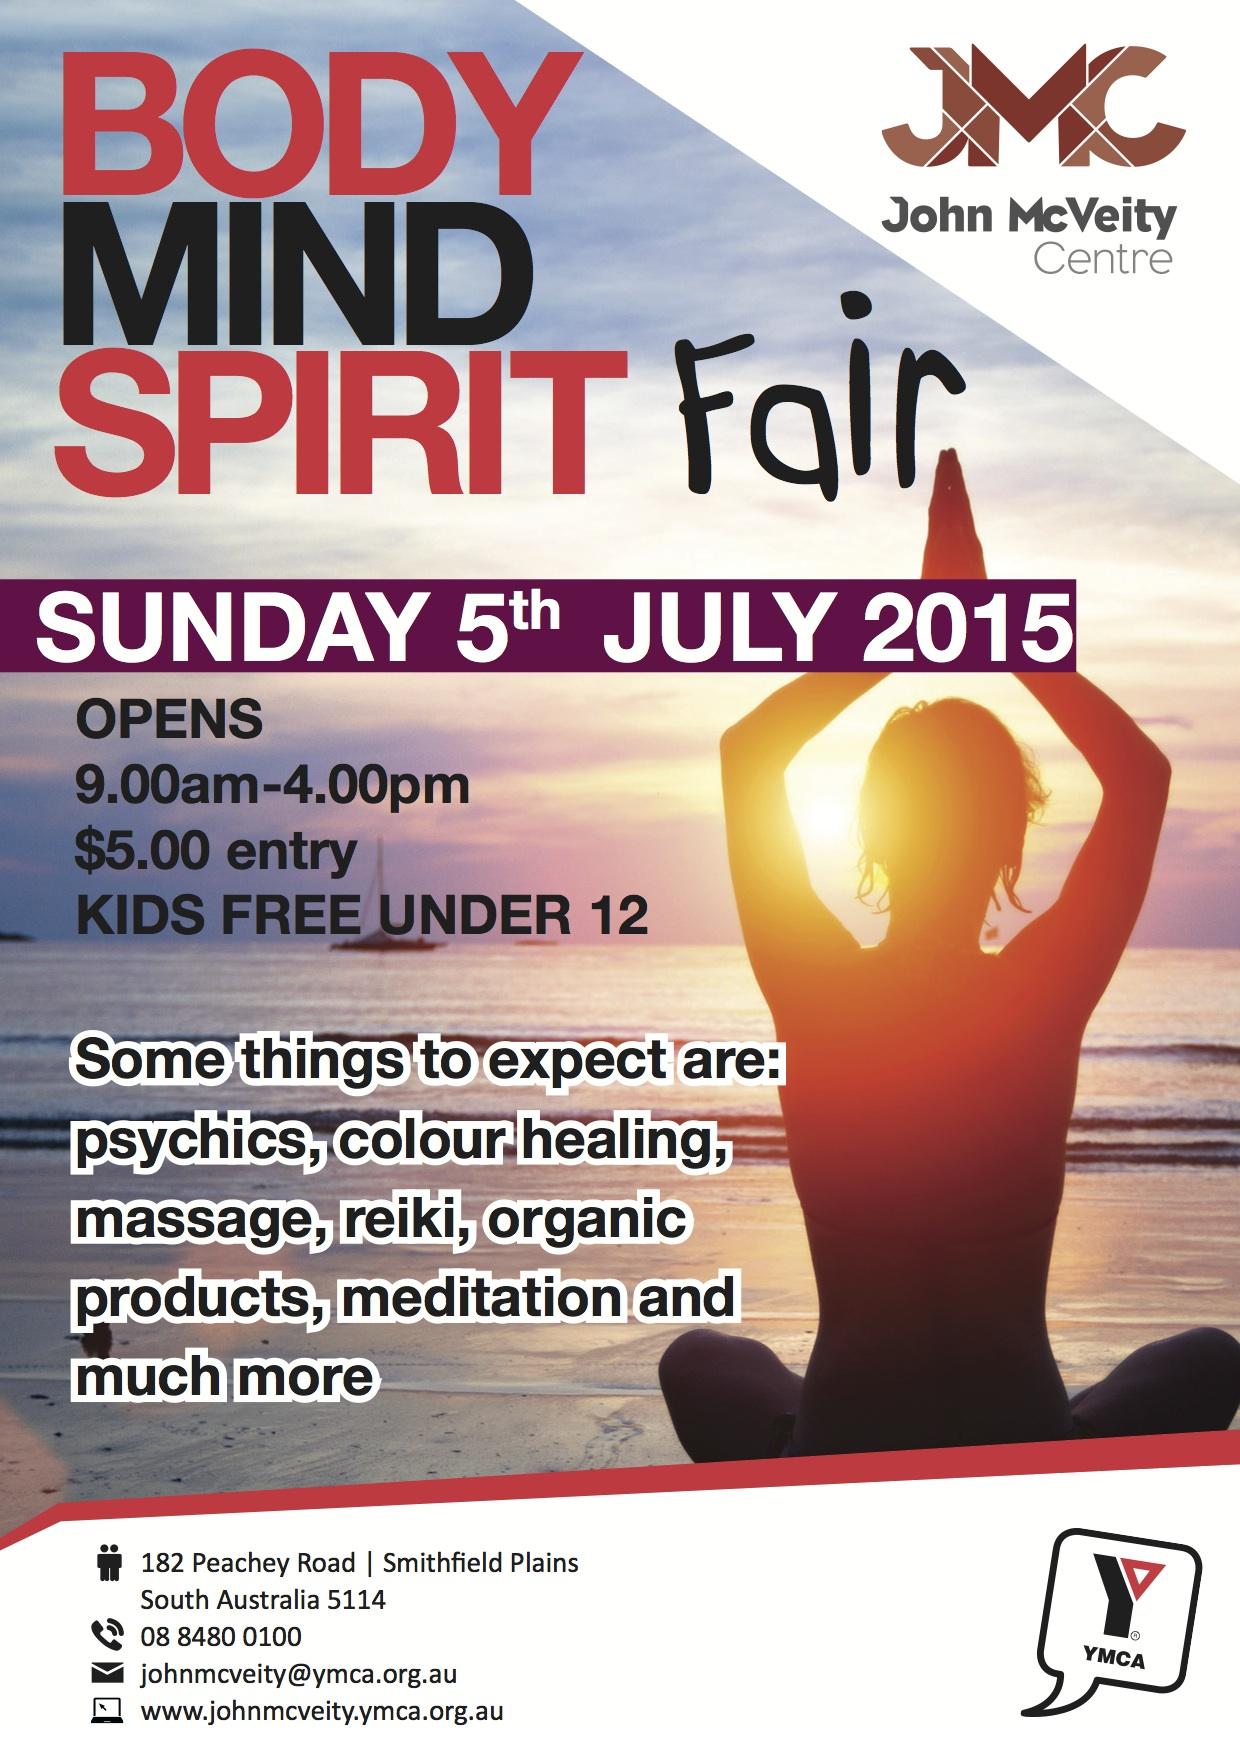 Body Mind Spirit Fair